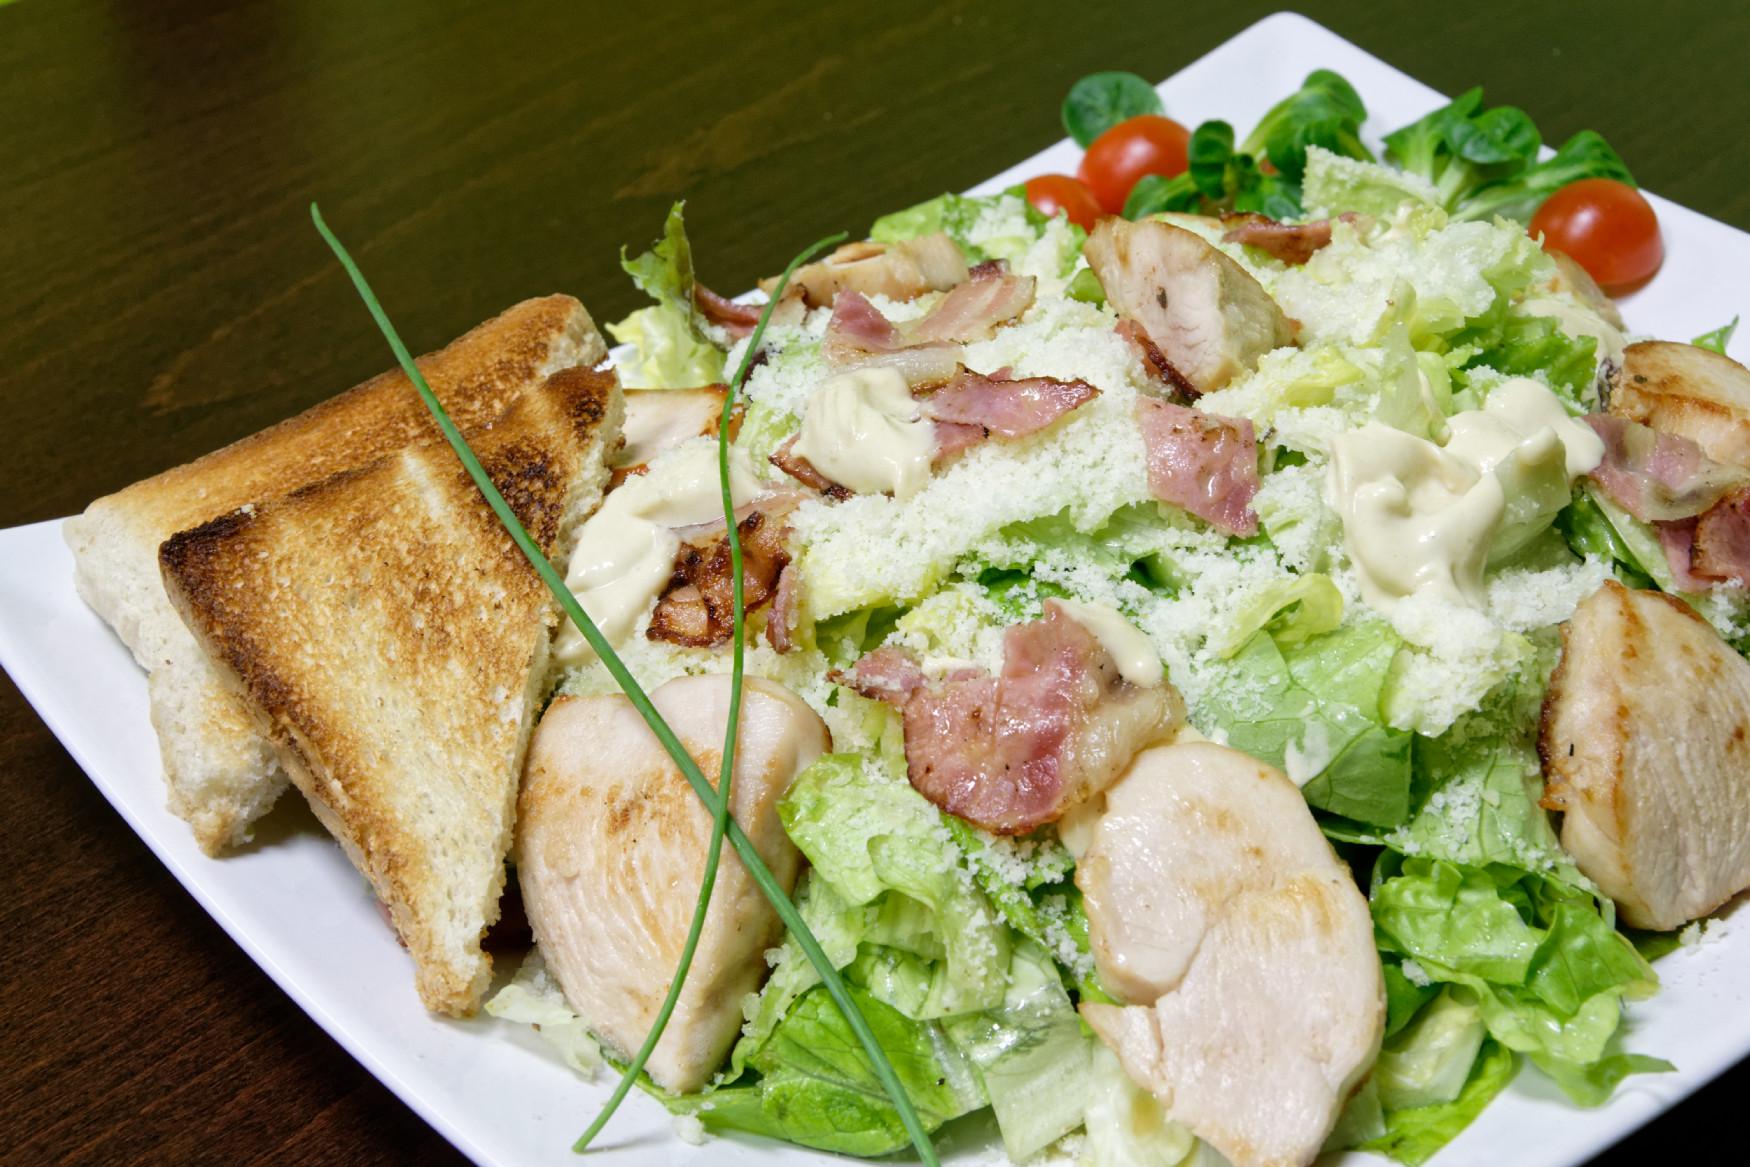 Mäso, parmezán, slanina a trošku šalátu :D